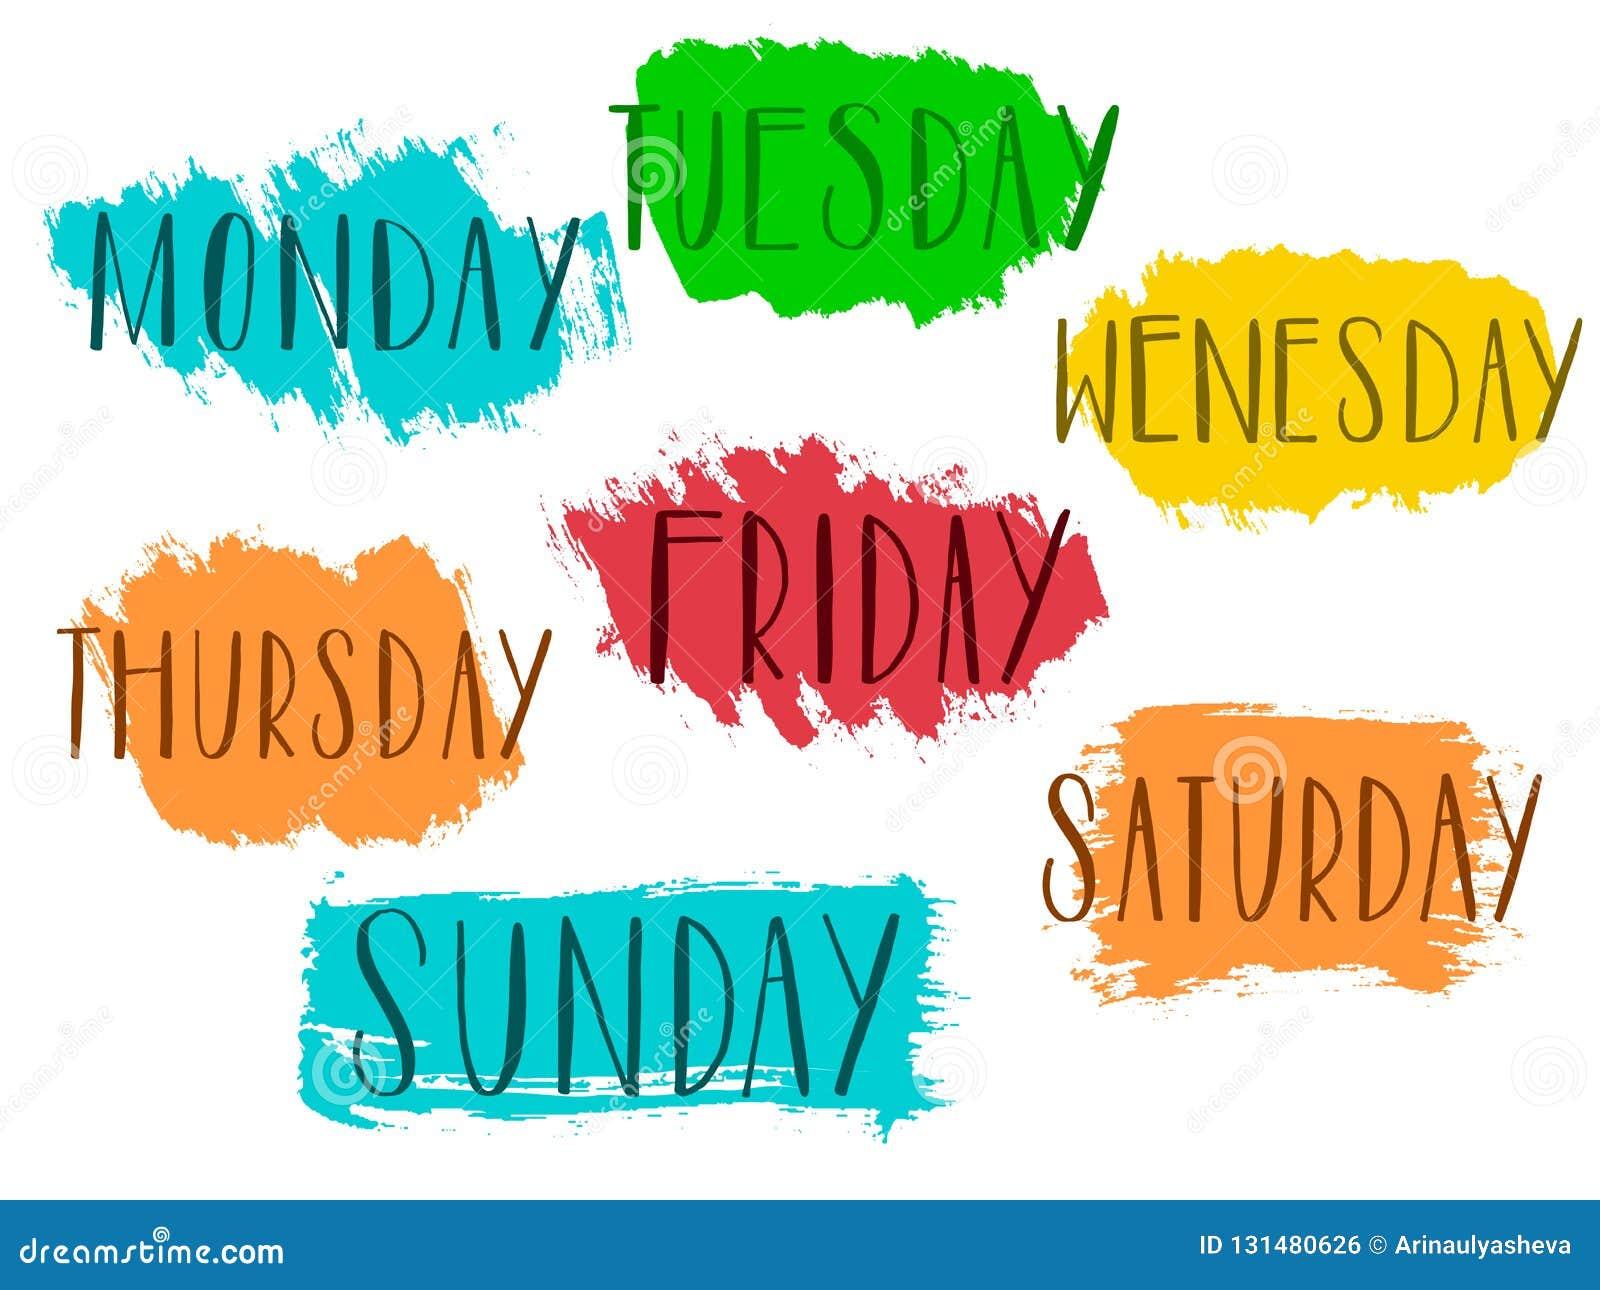 Handwritten Days Of The Week Monday Tuesday Wednesday